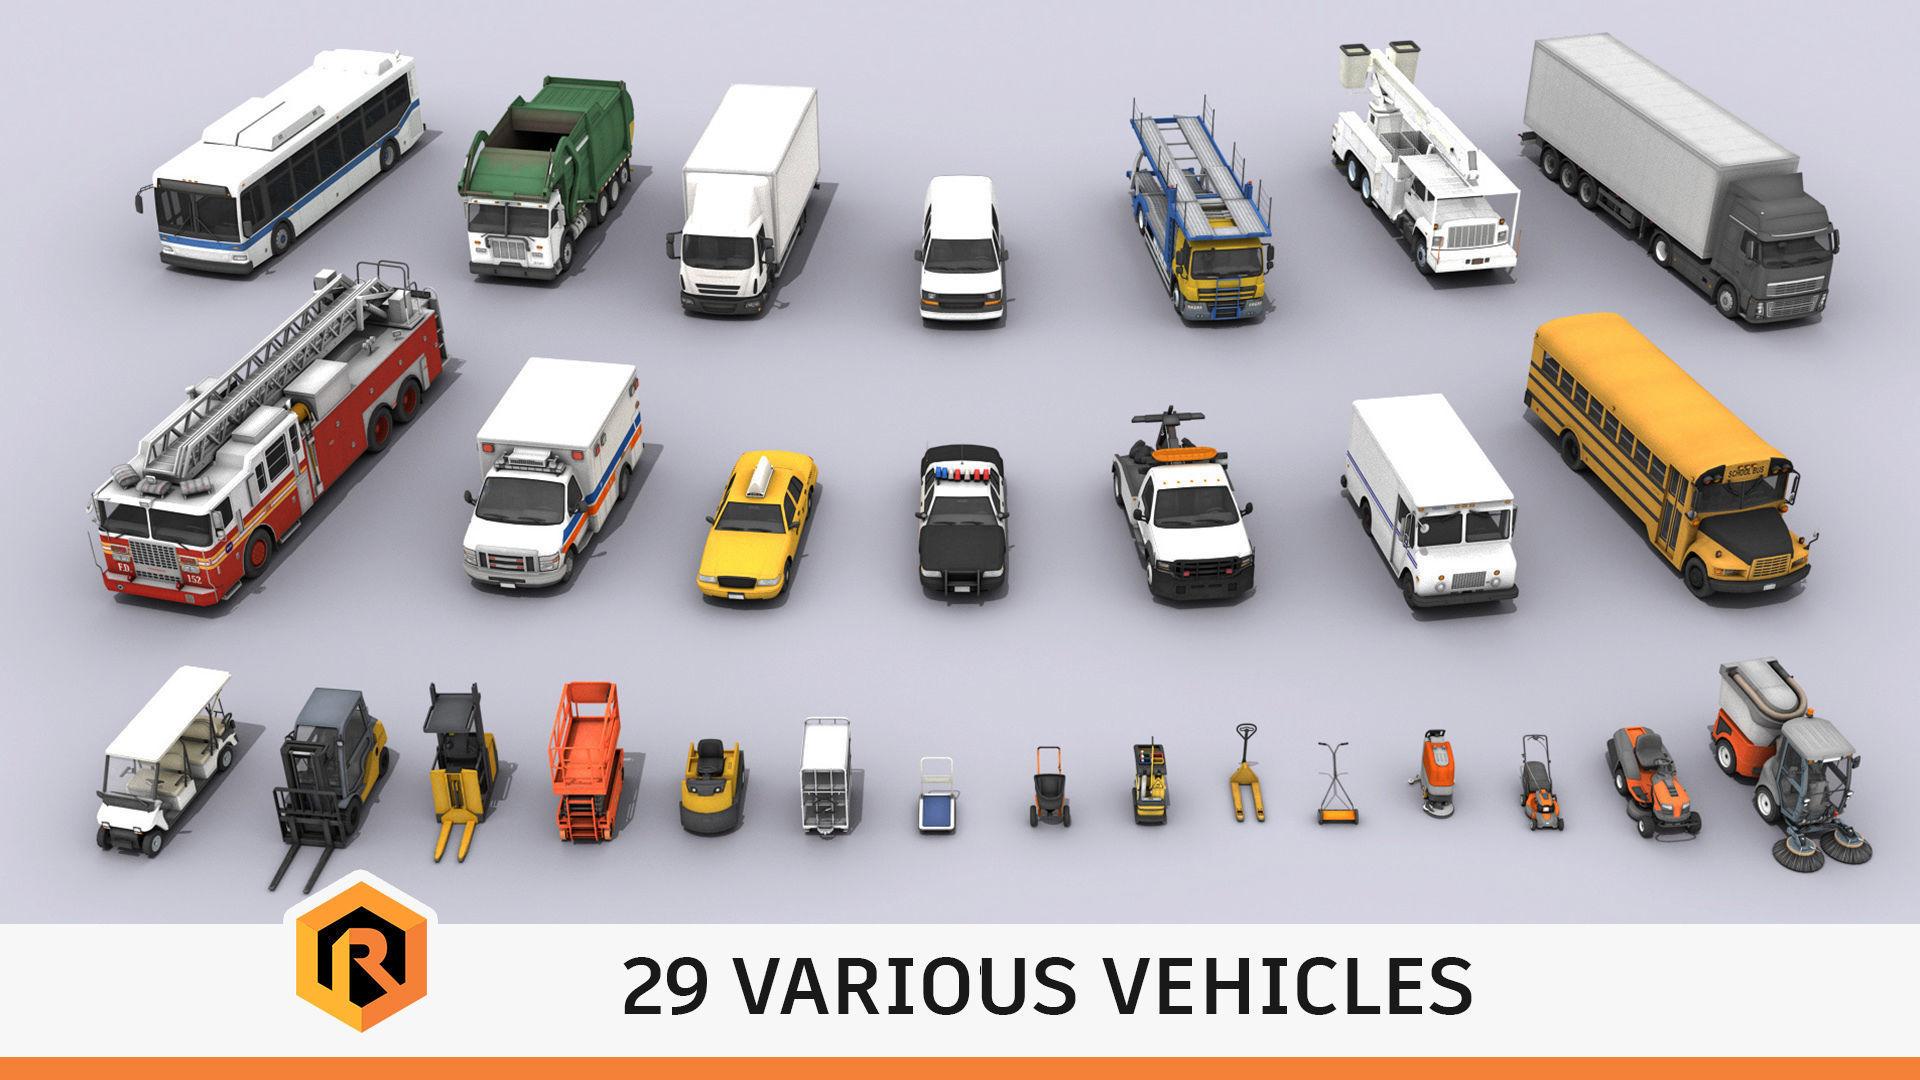 29 HQ Vehicles - Mega Collection